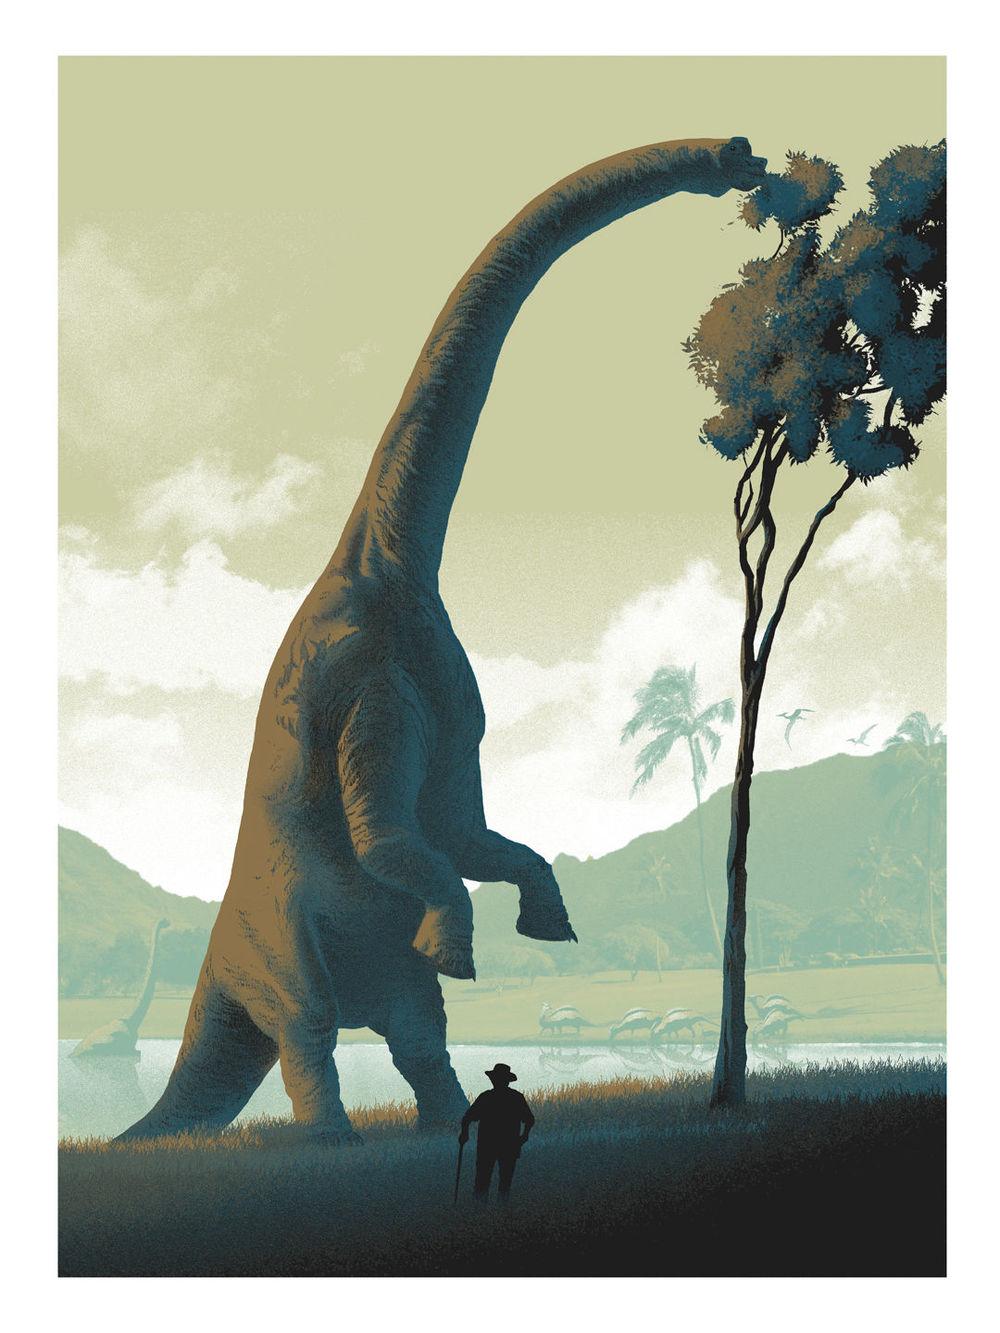 New JURASSIC PARK Inspired Print  Its A Dinosaur  GeekTyrant